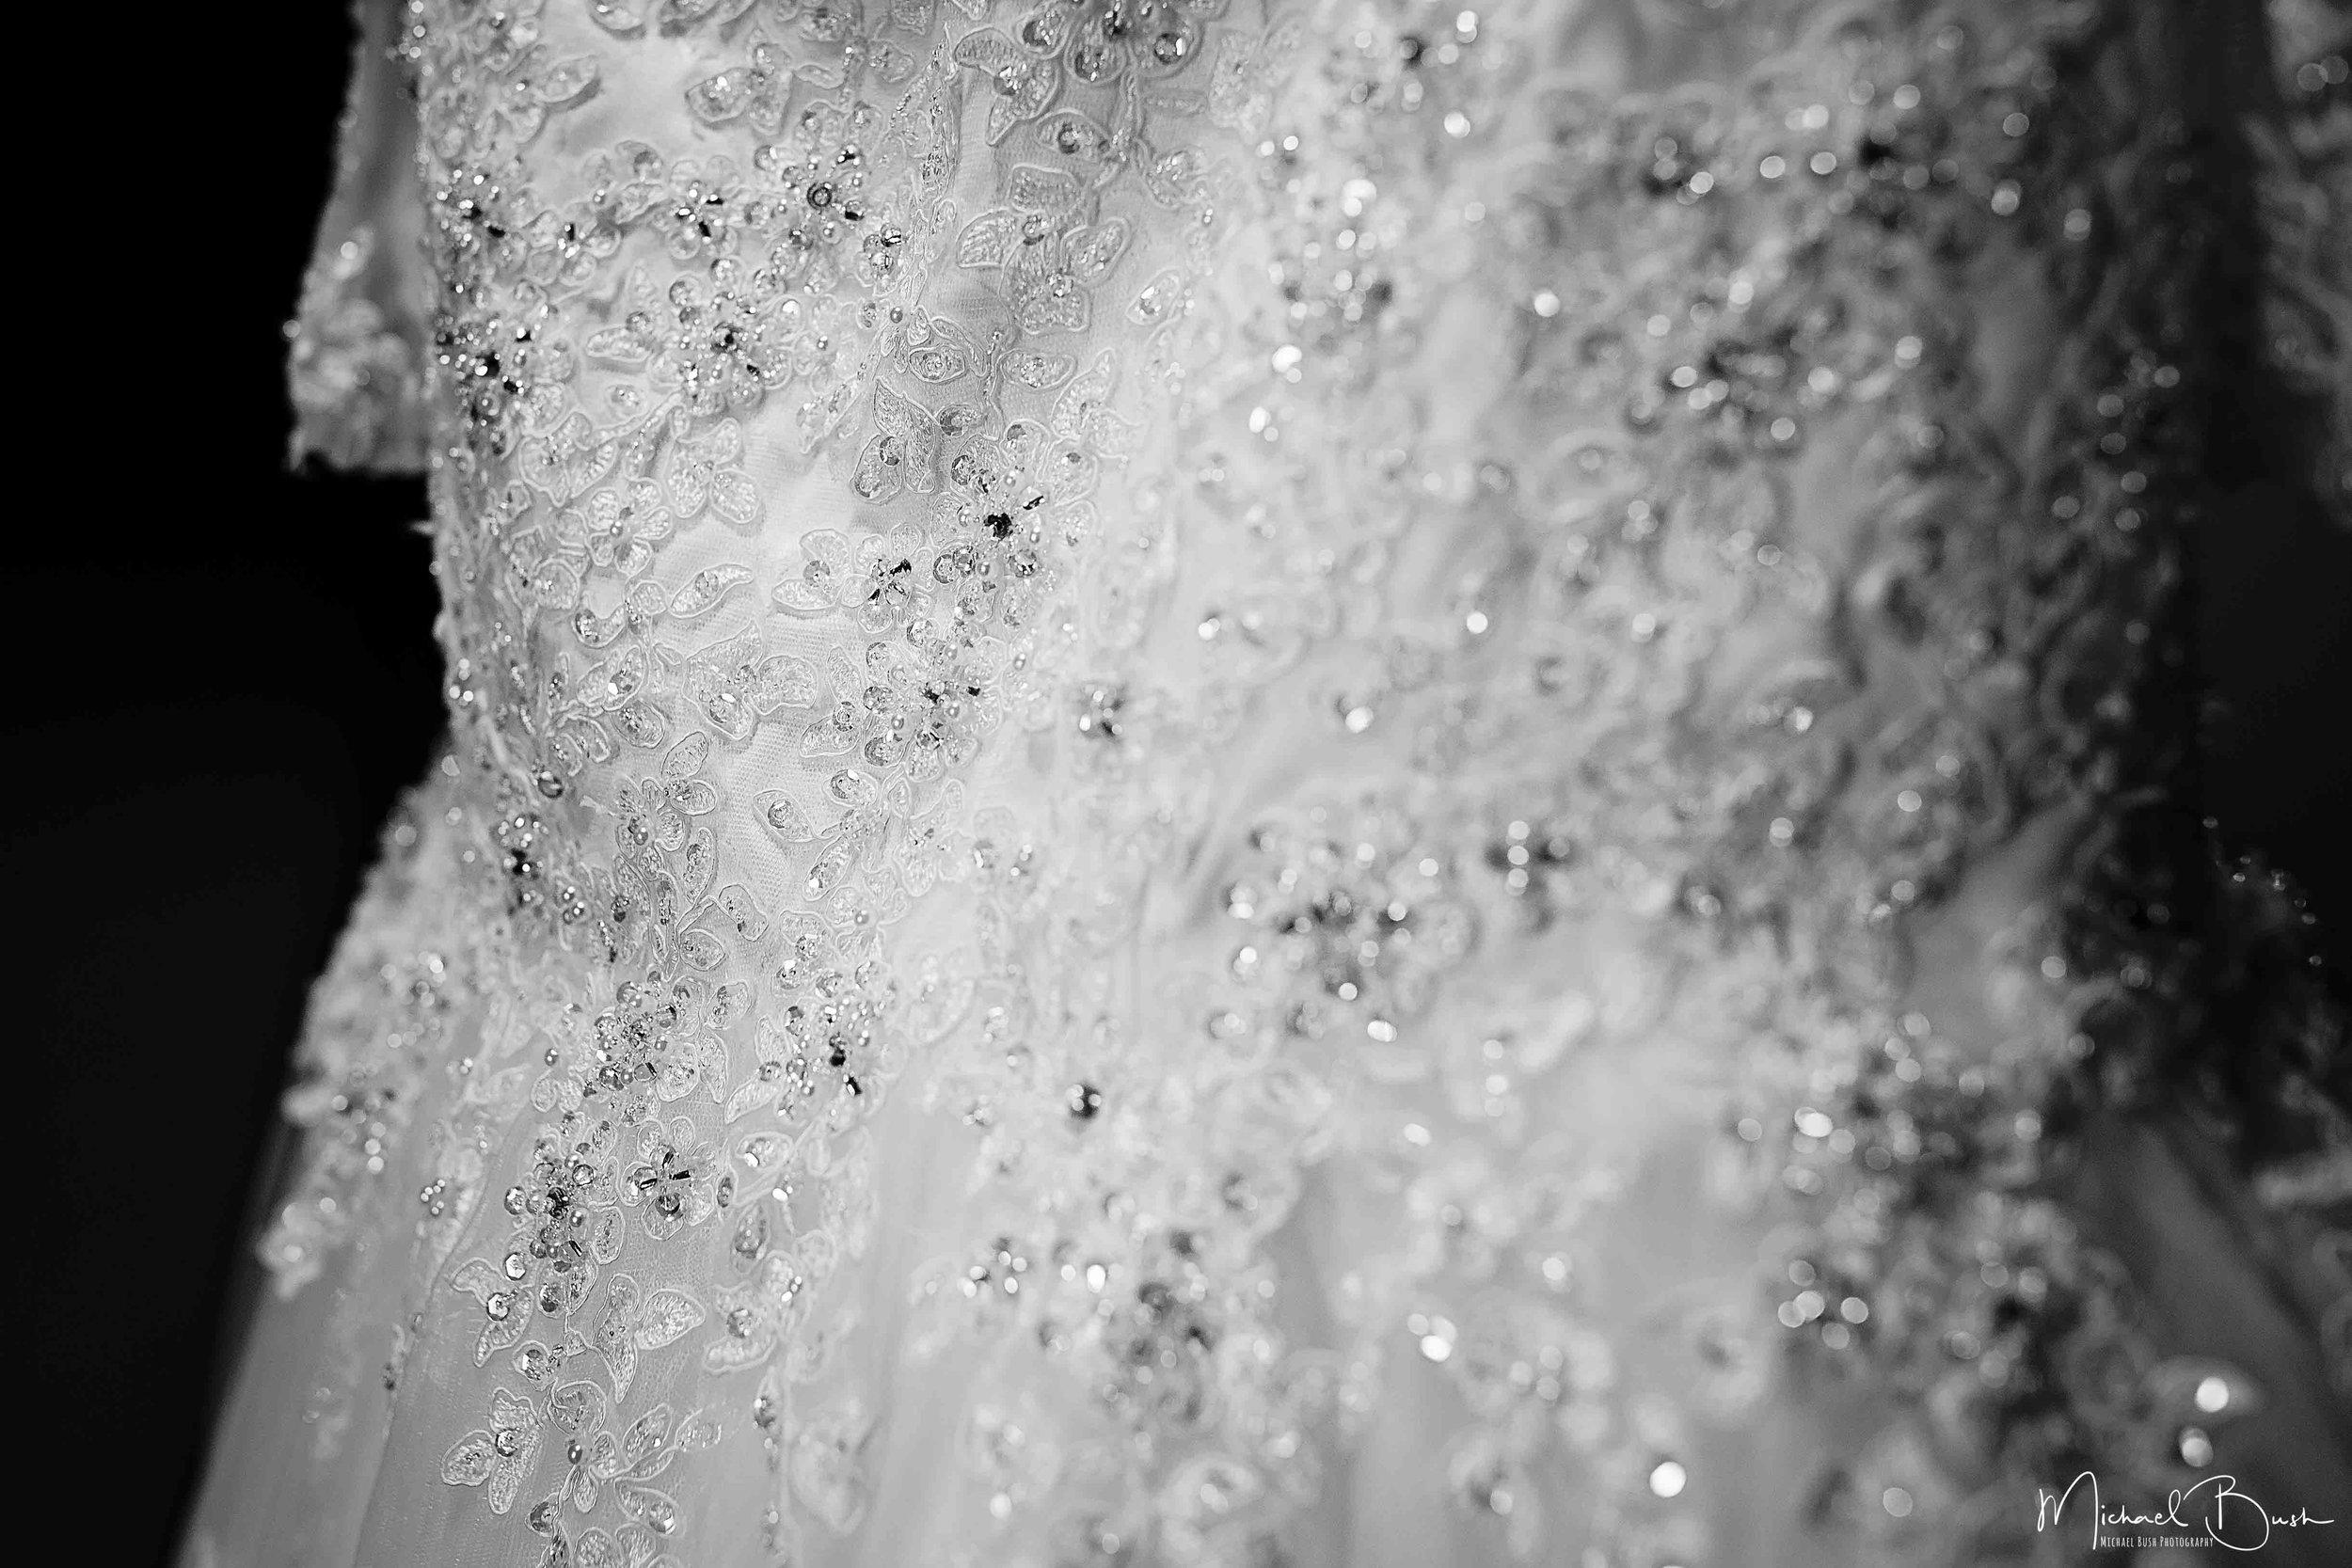 Wedding-Details-Bride-Fort Worth-colors-Getting Ready-MUA-brides-closeup-details-weddingdress-dress.jpg